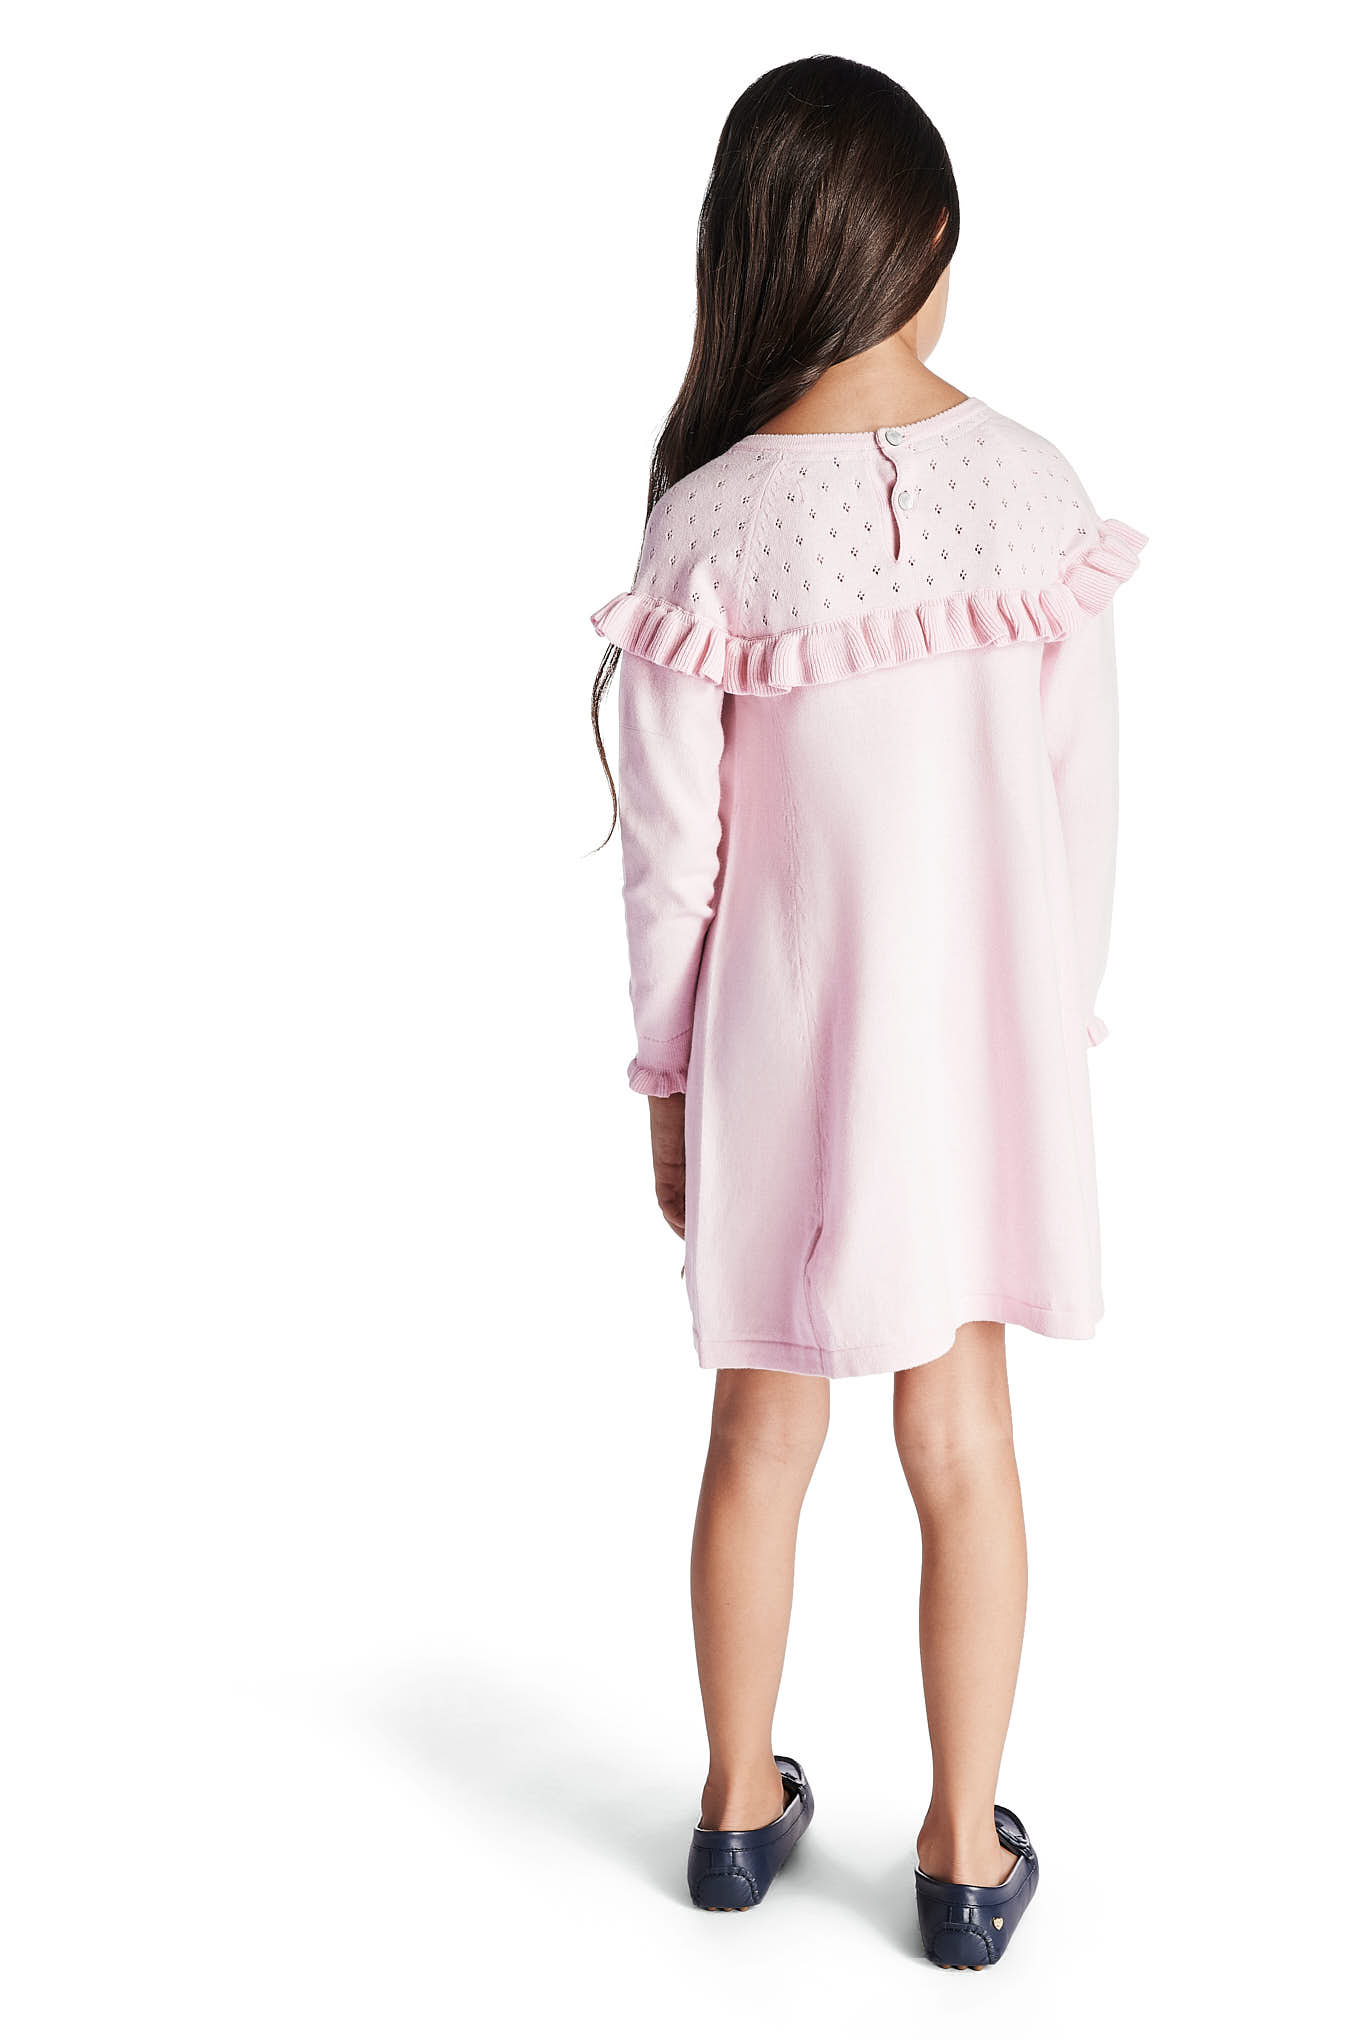 Knitwear Dress Light Pink Casual Girl